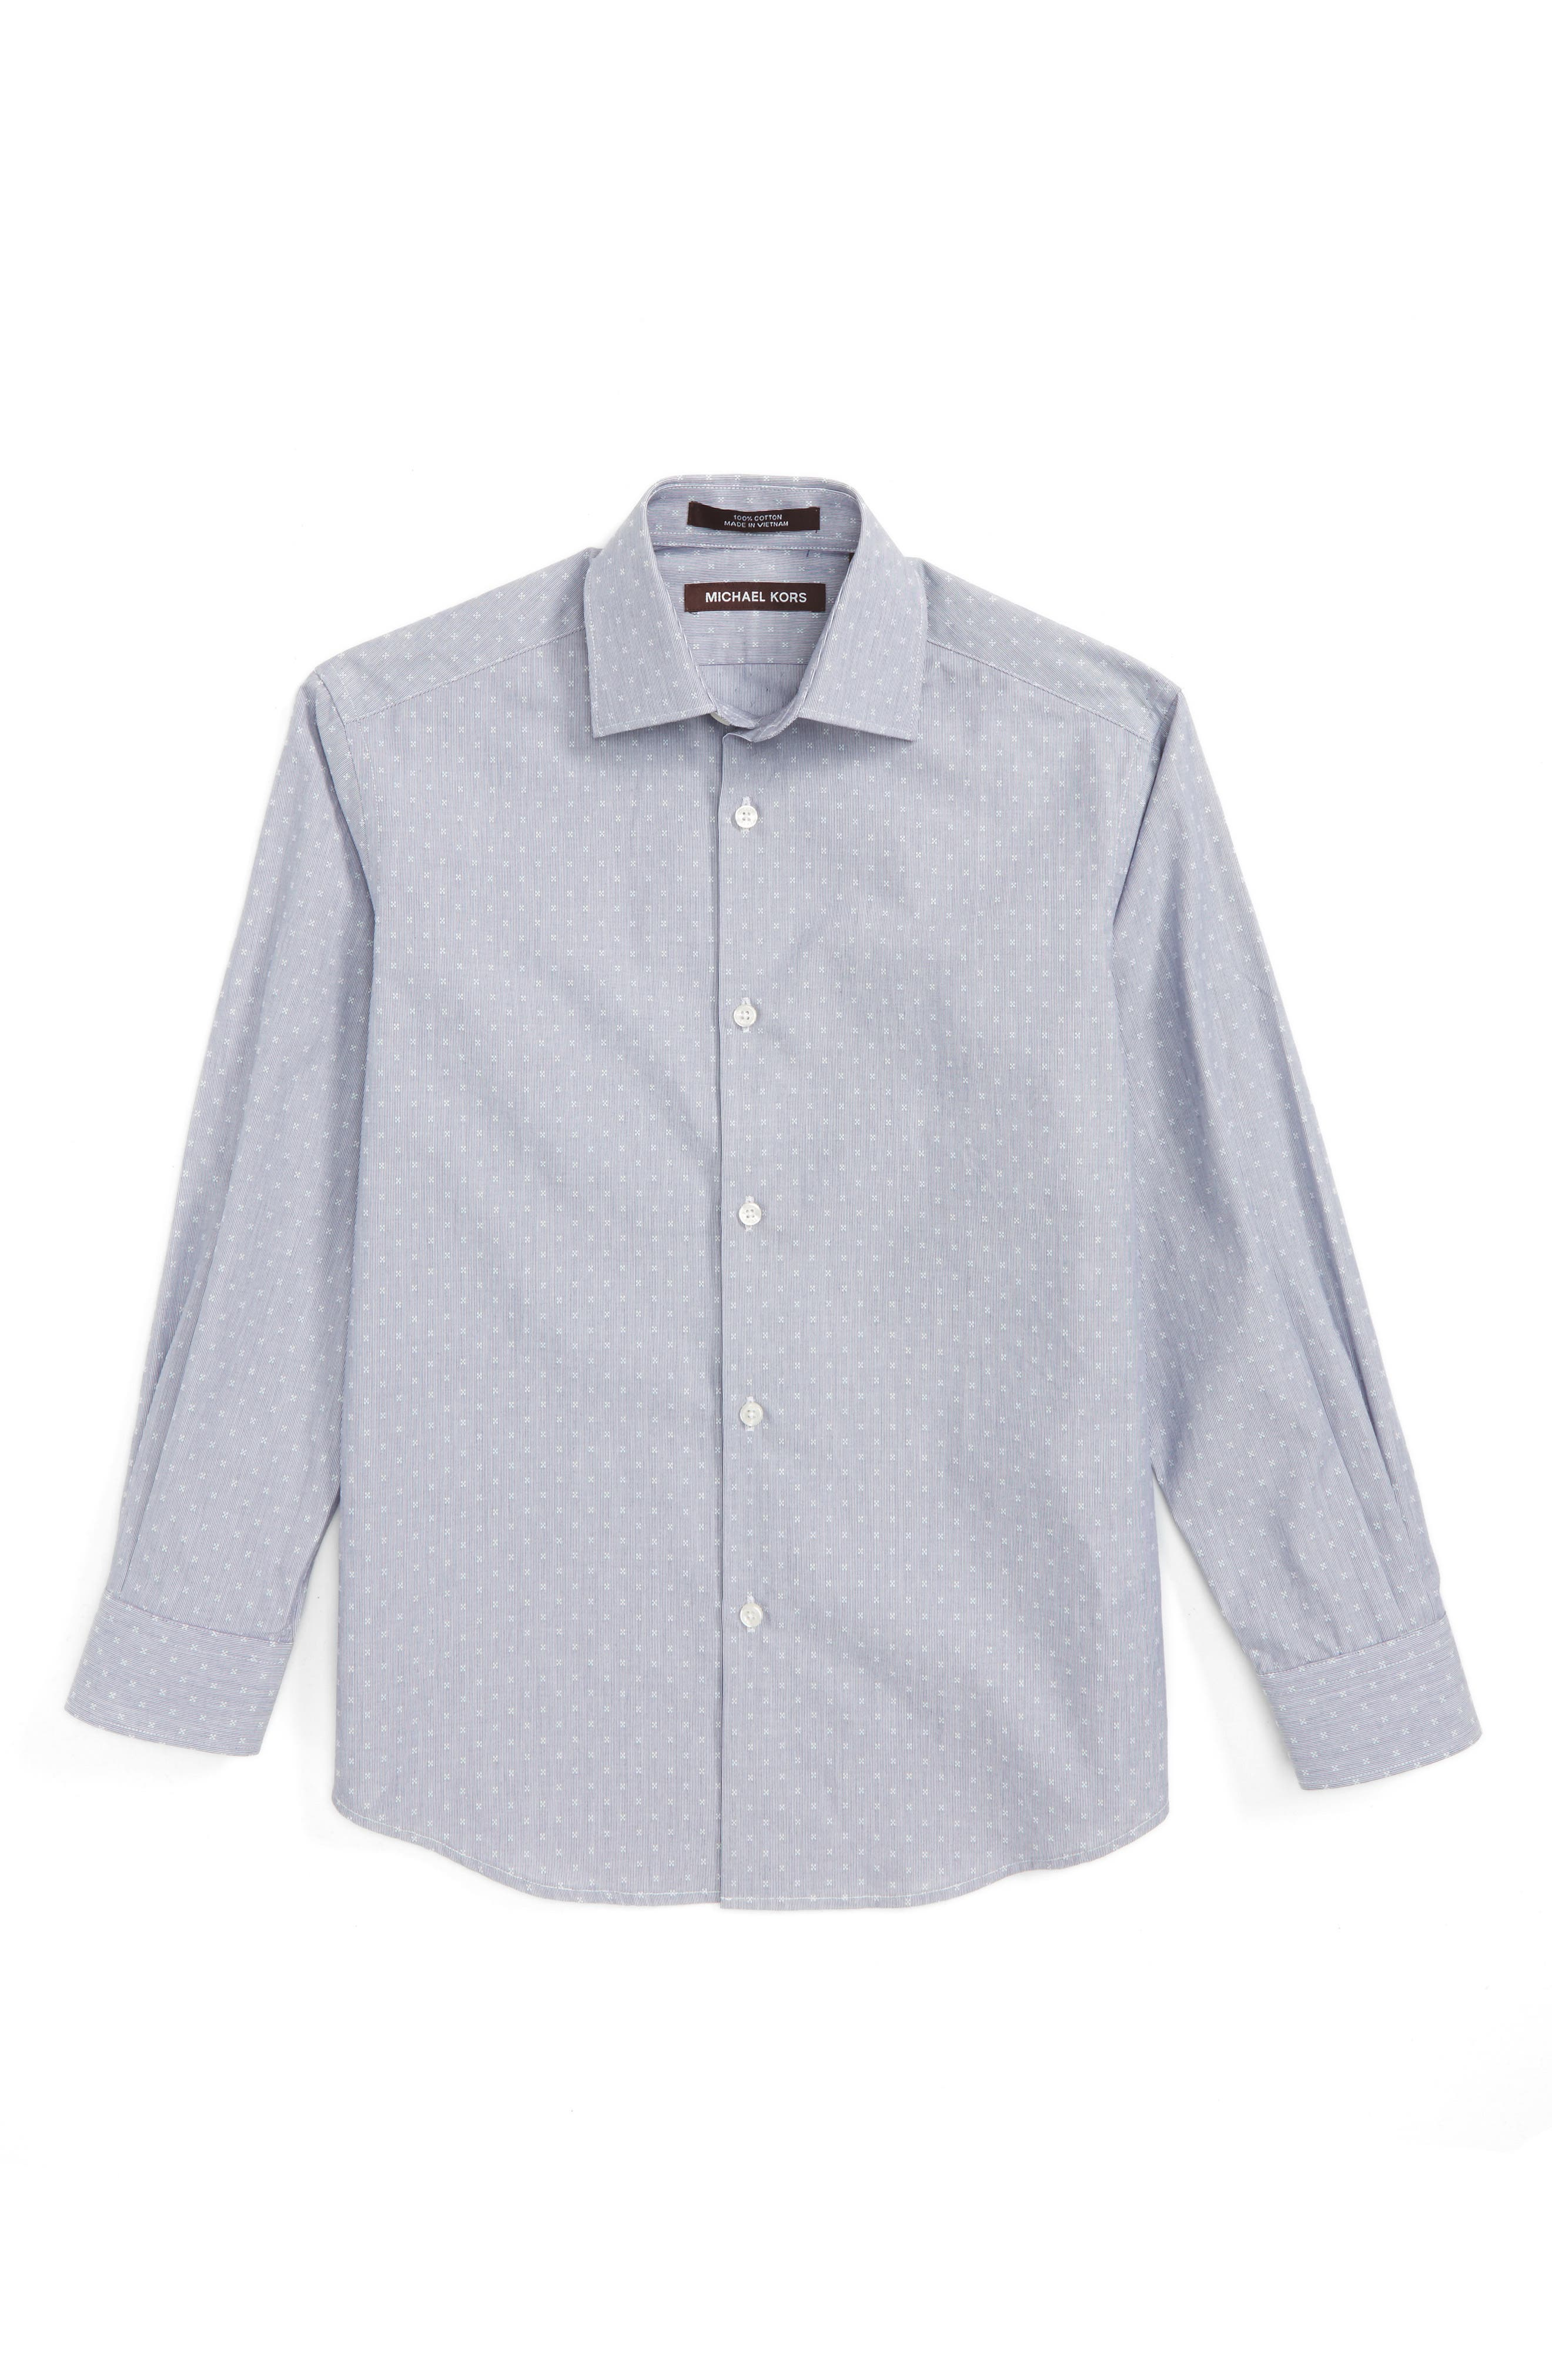 MICHAEL KORS Stripe Neat Dress Shirt